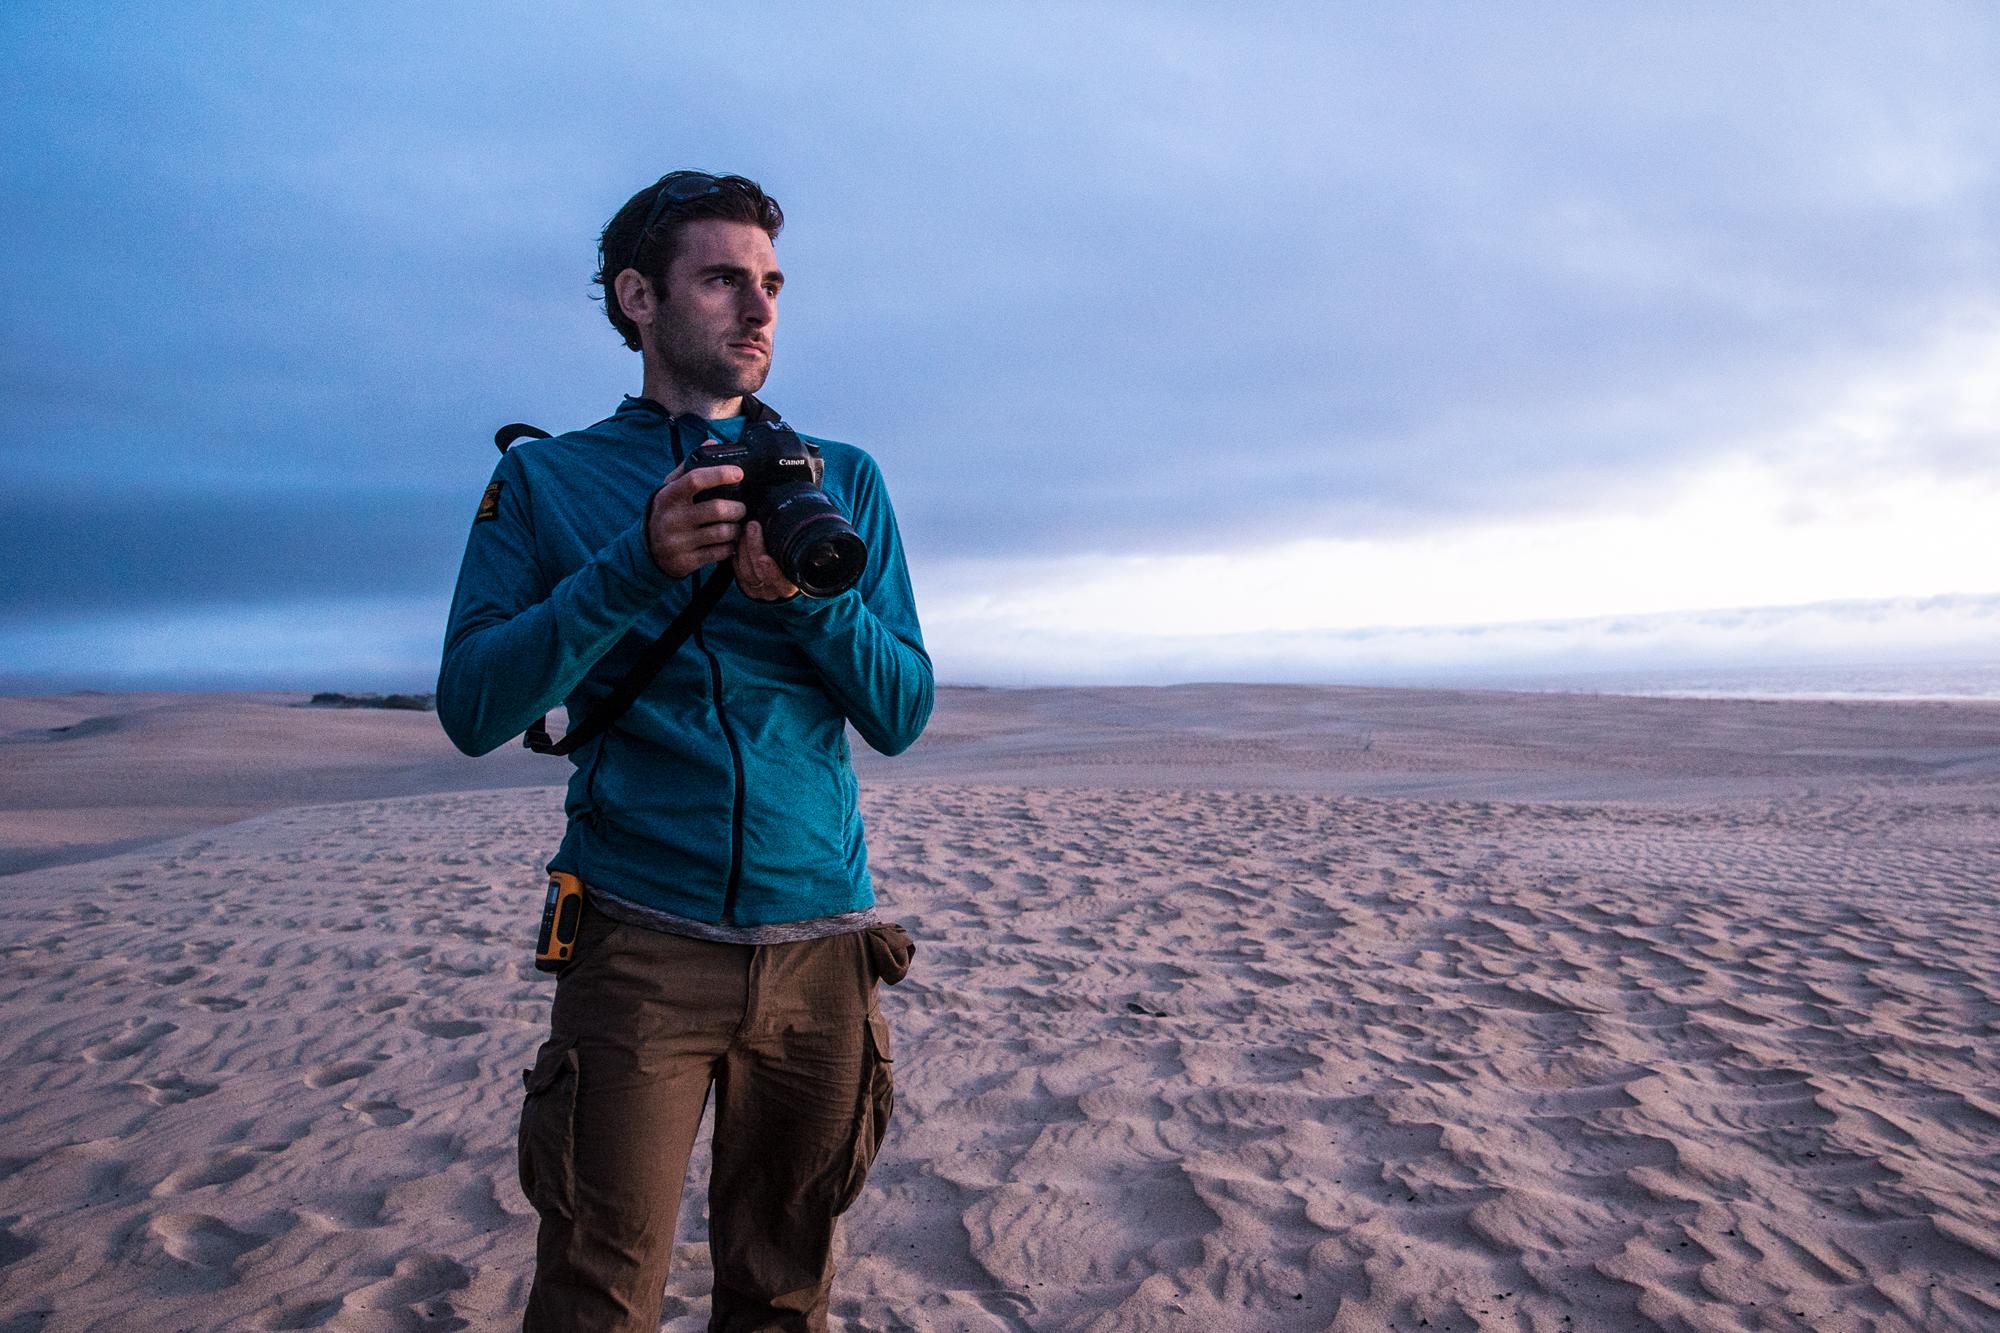 Ben Sherlock standing with camera in Australian desert